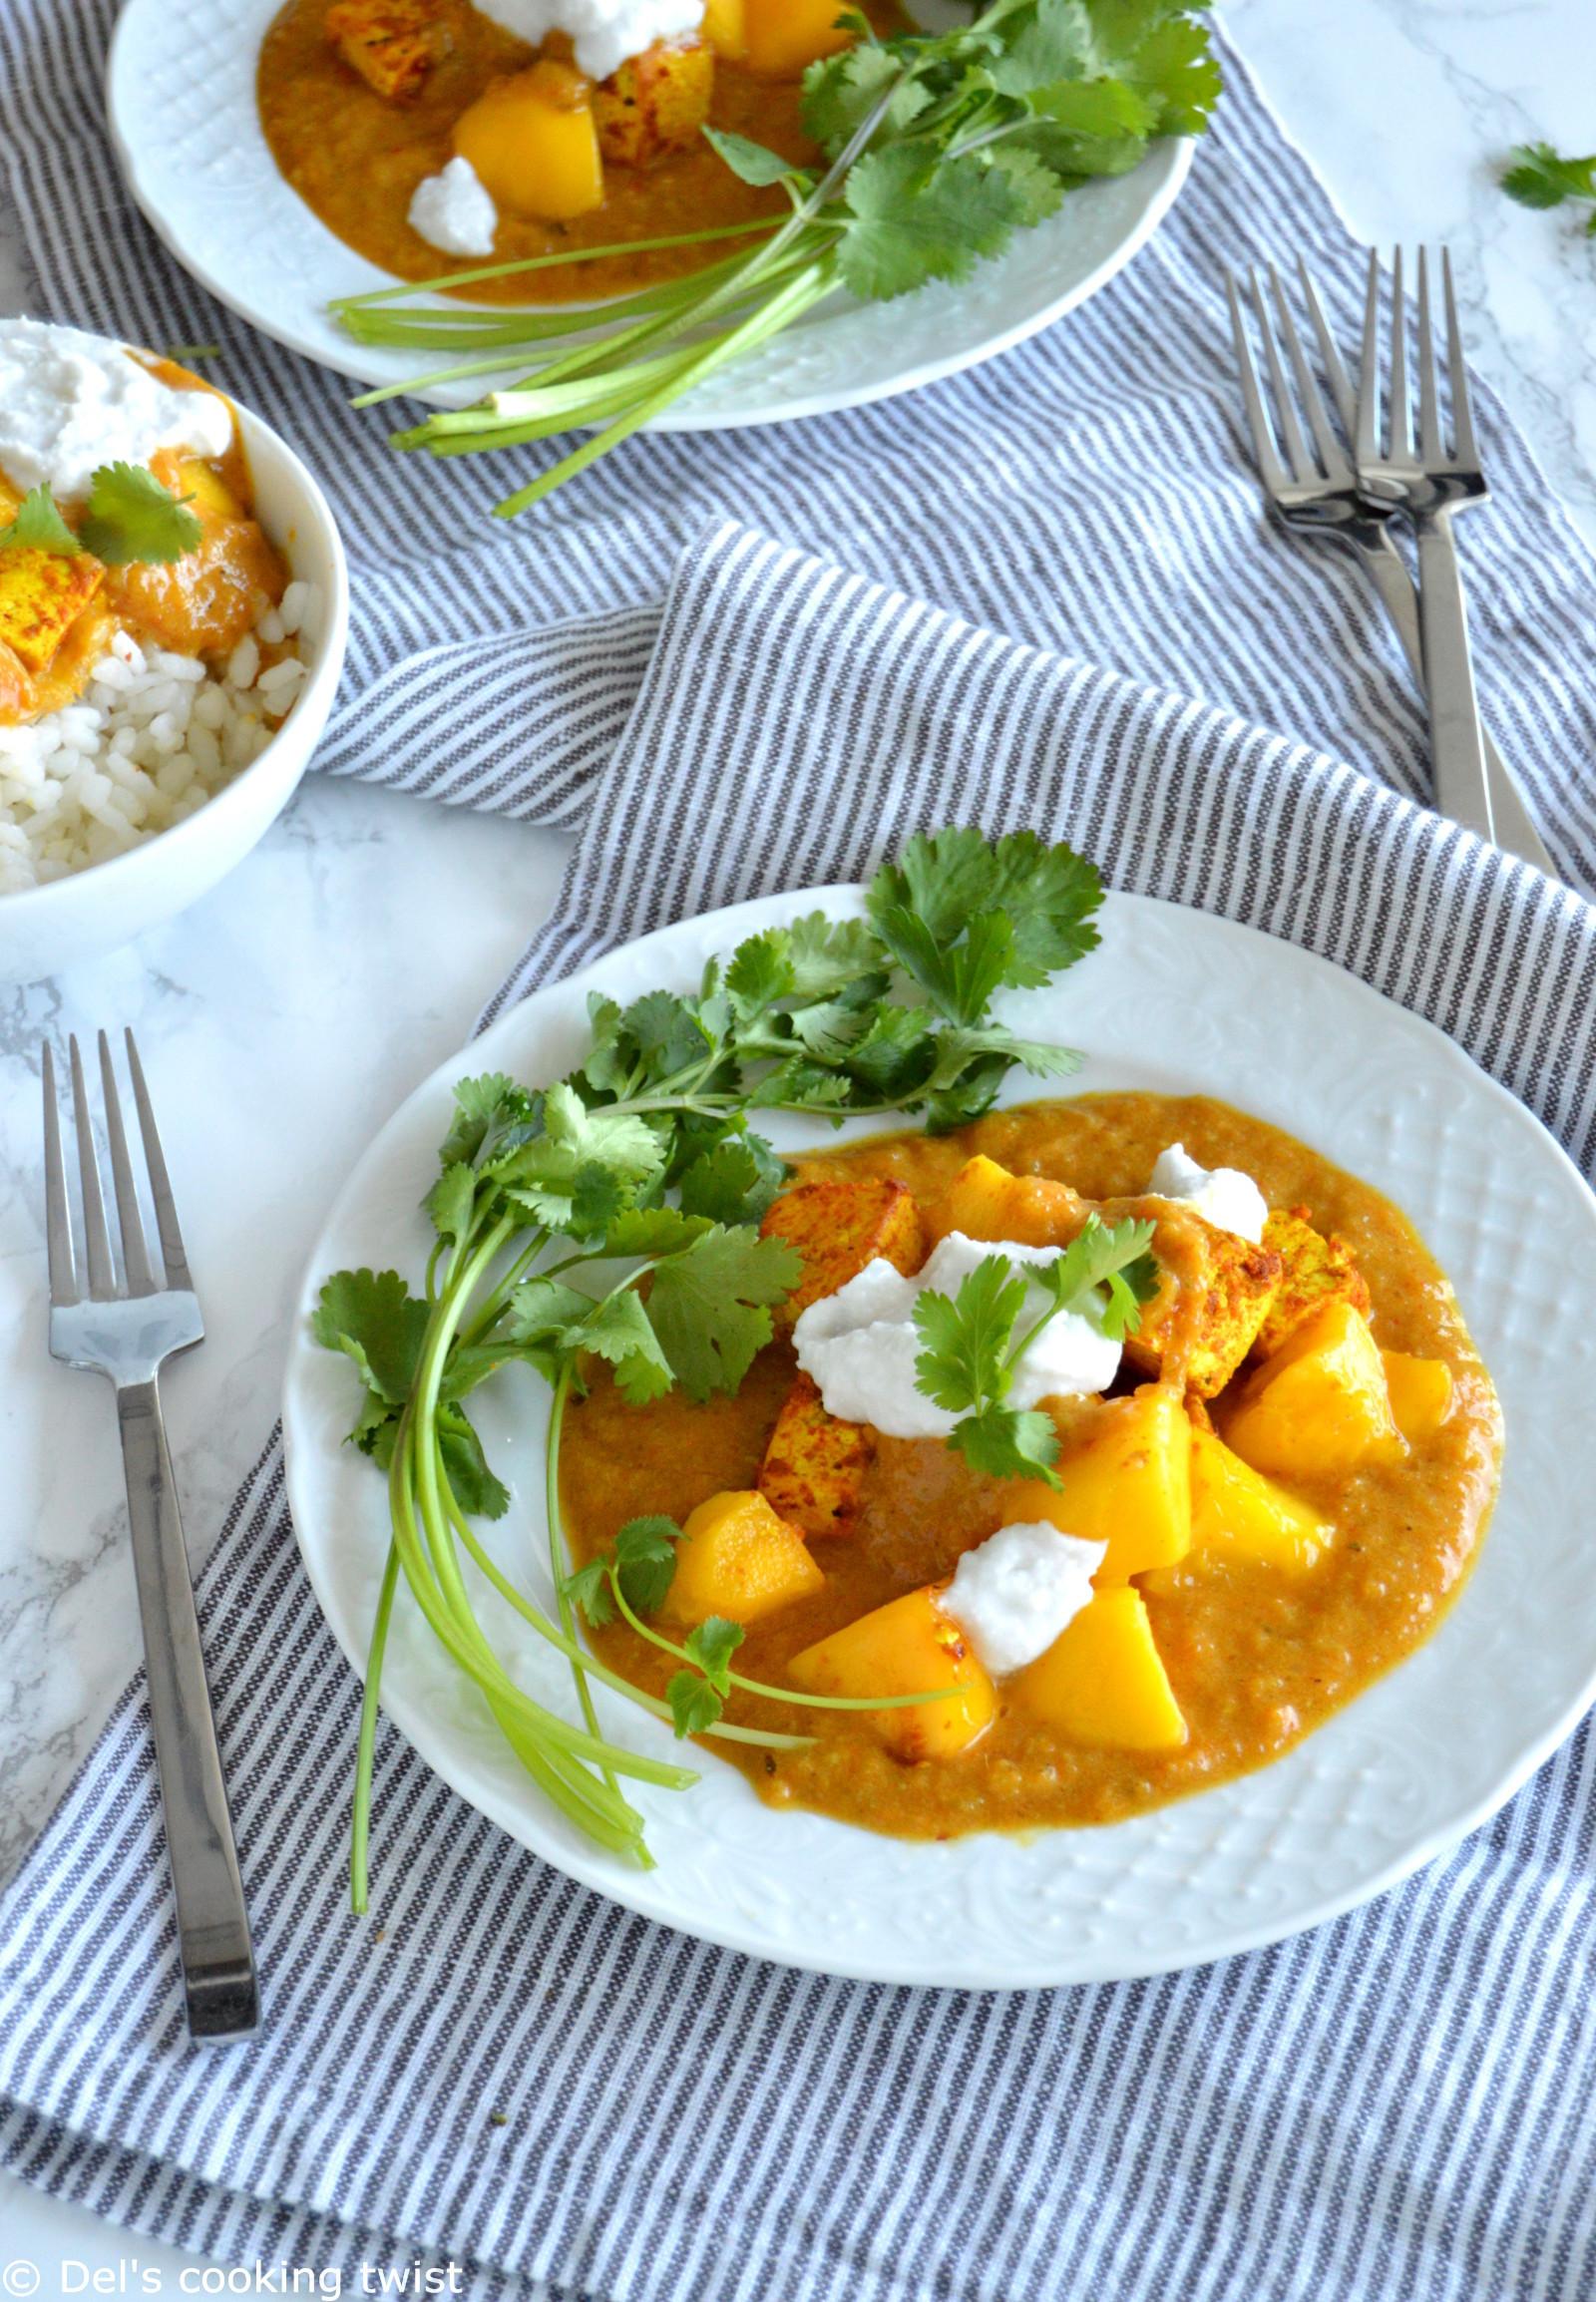 Tofu Curry Recipes  Mango Curry Tofu Vegan Gluten Free — Del s cooking twist